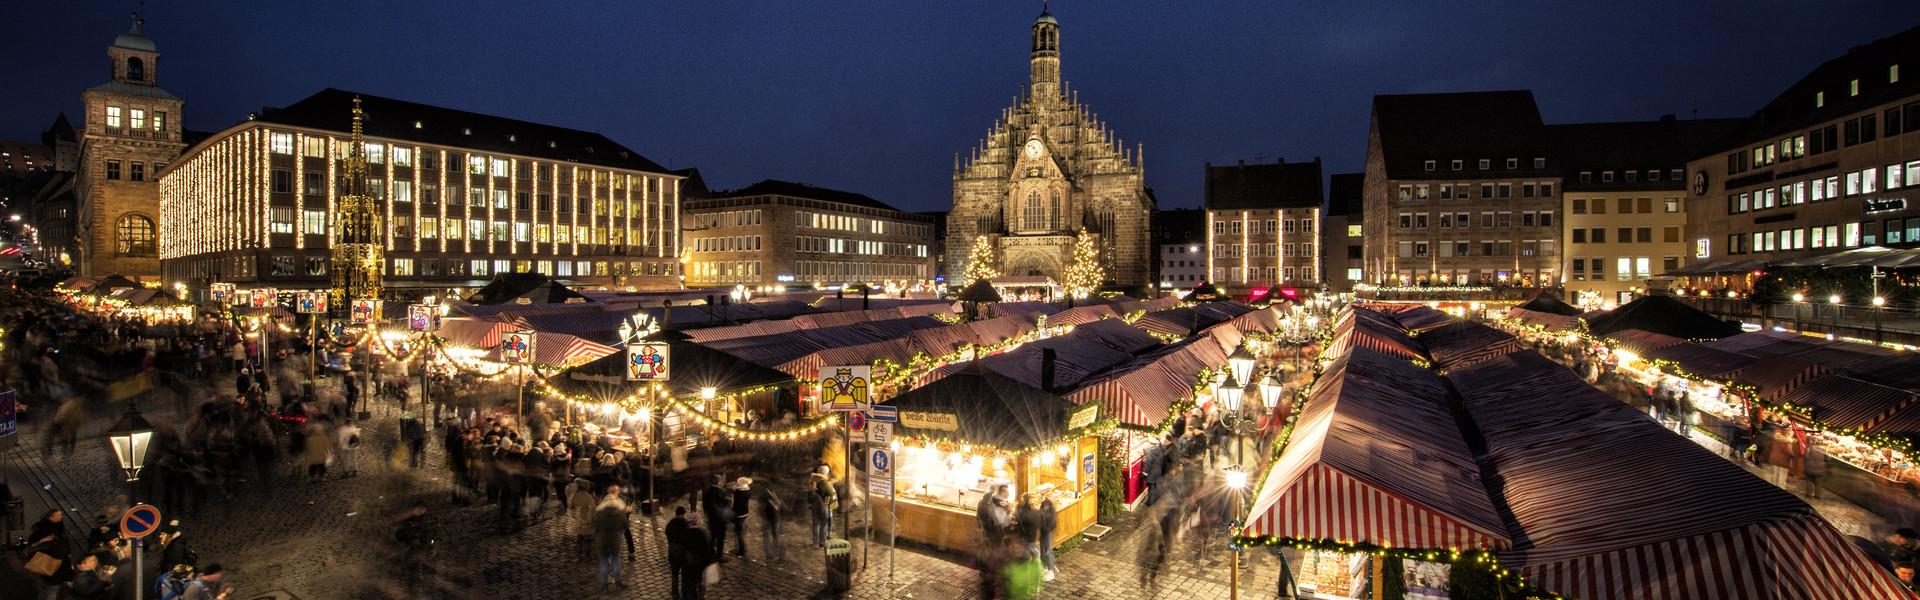 foto oficial do mercado de natal em nuremberg https://tourismus.nuernberg.de/en/experience/christkindlesmarkt/